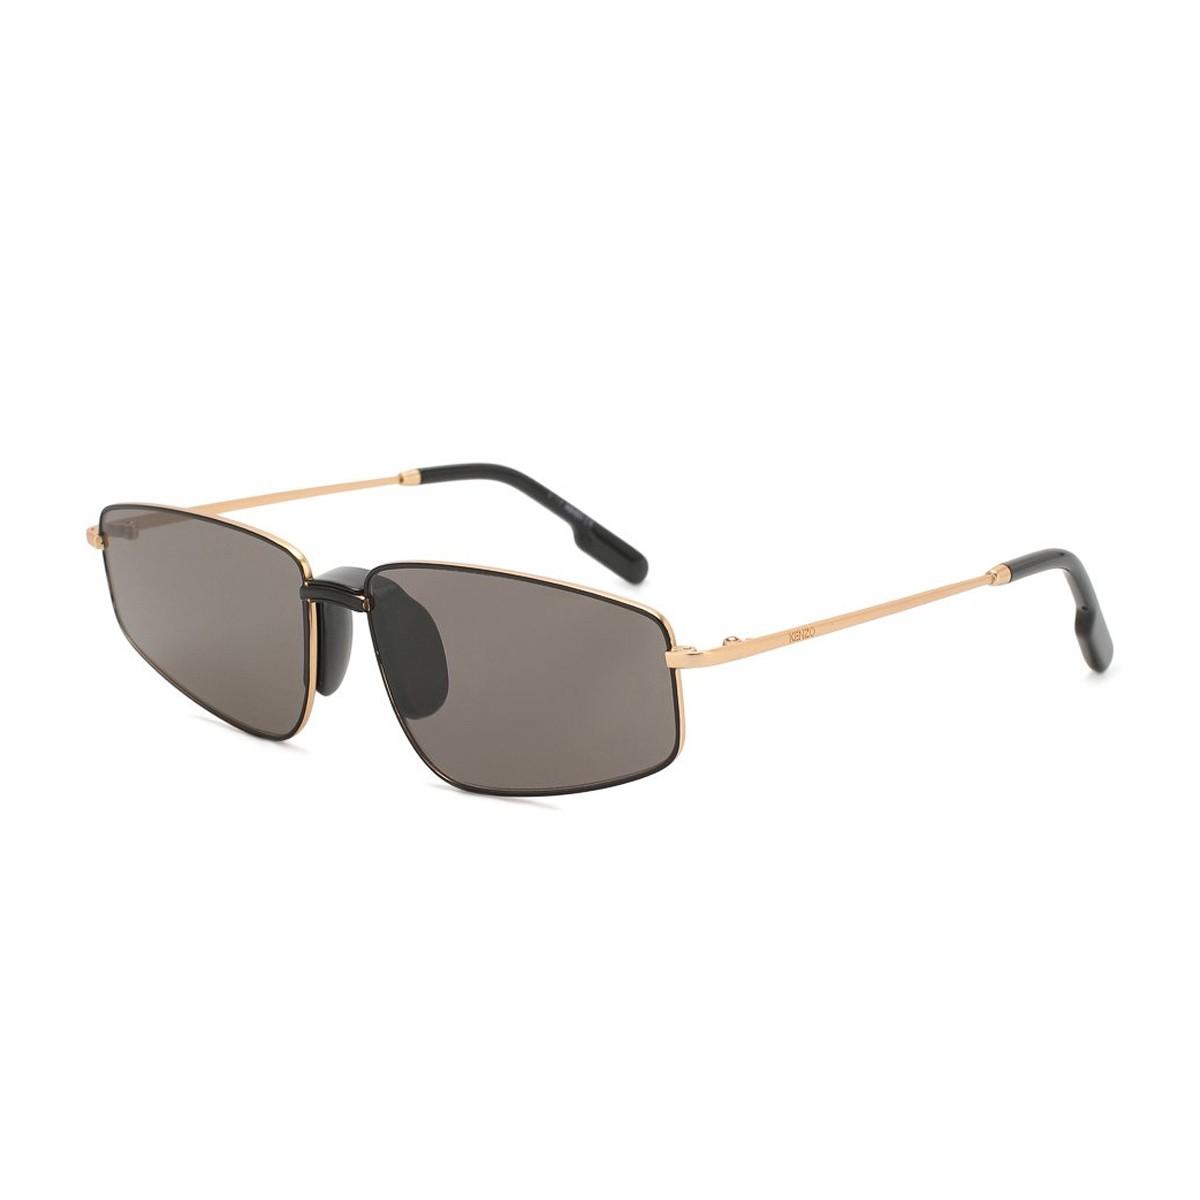 Kenzo KZ40015U | Unisex sunglasses